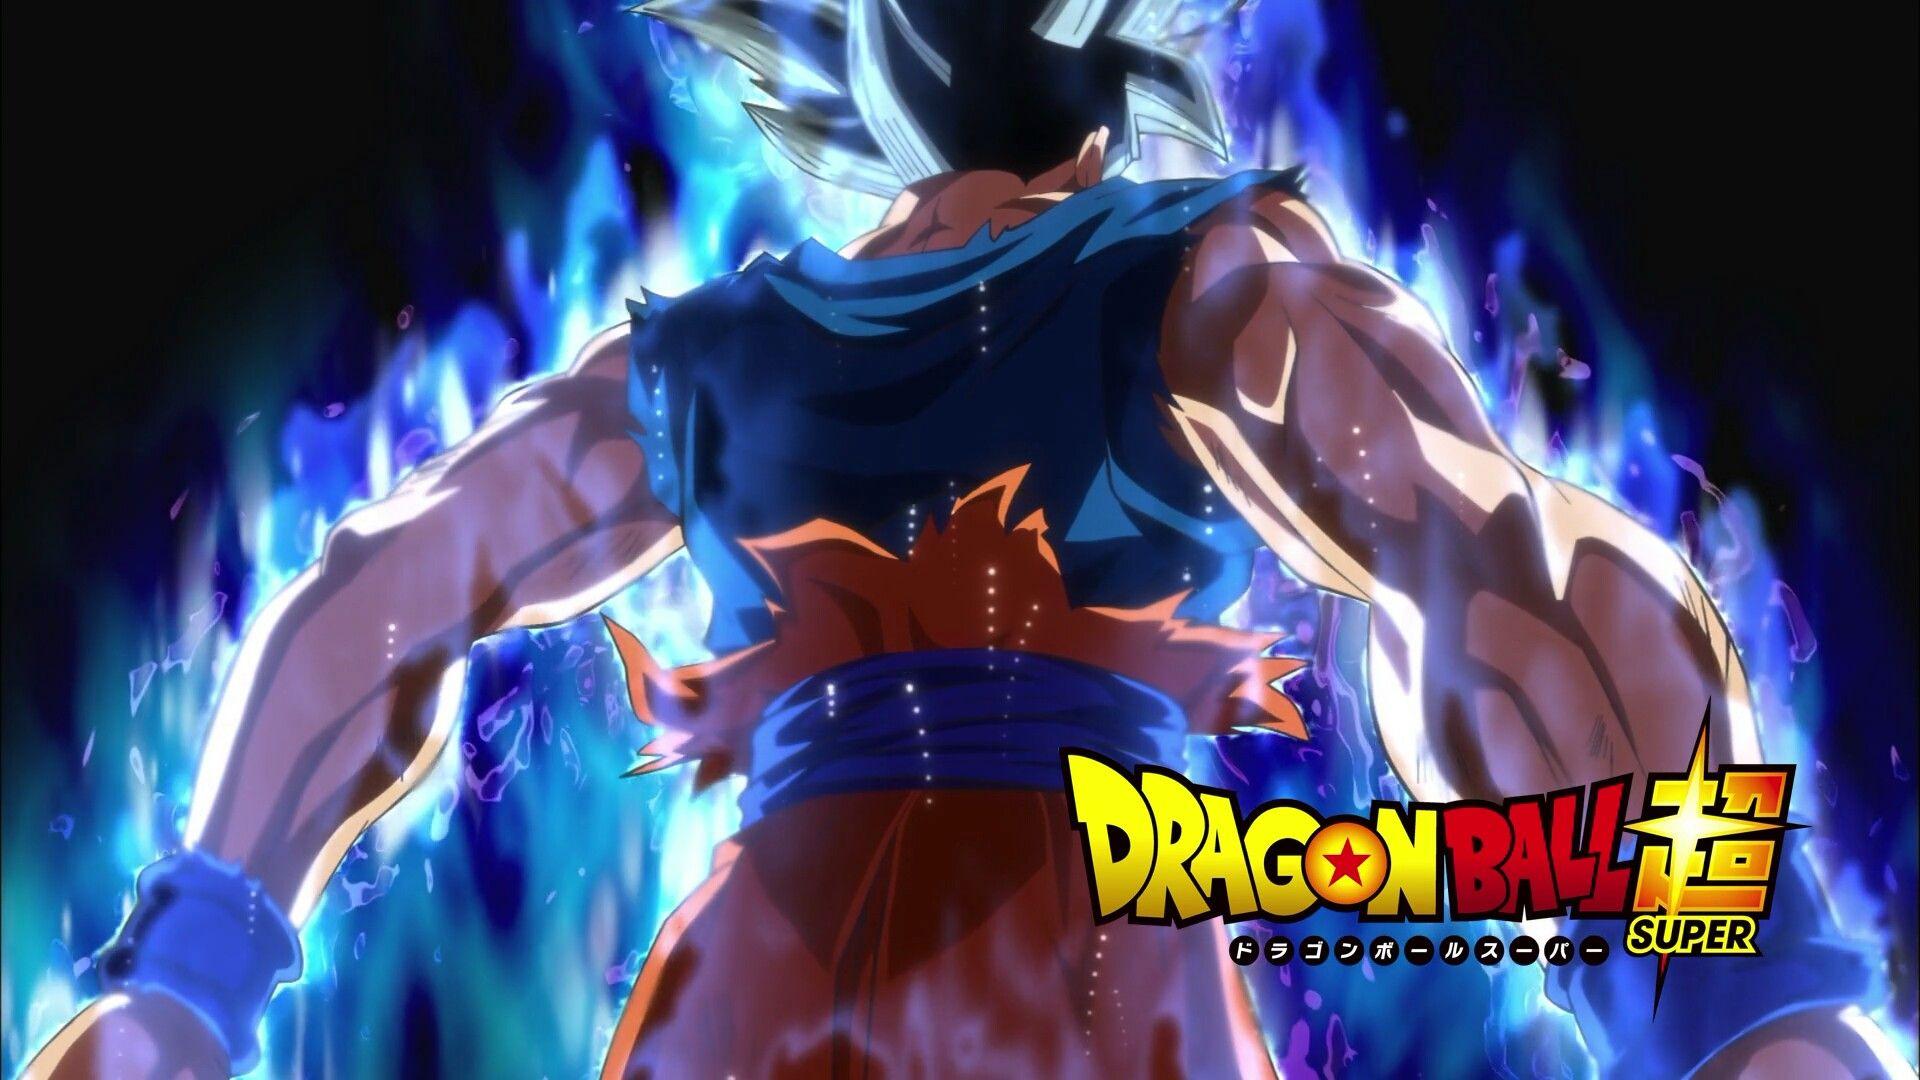 Dragonball Super Ultra Instinct Goku Dragon Ball Super Goku Dragon Ball Super Dragon Ball